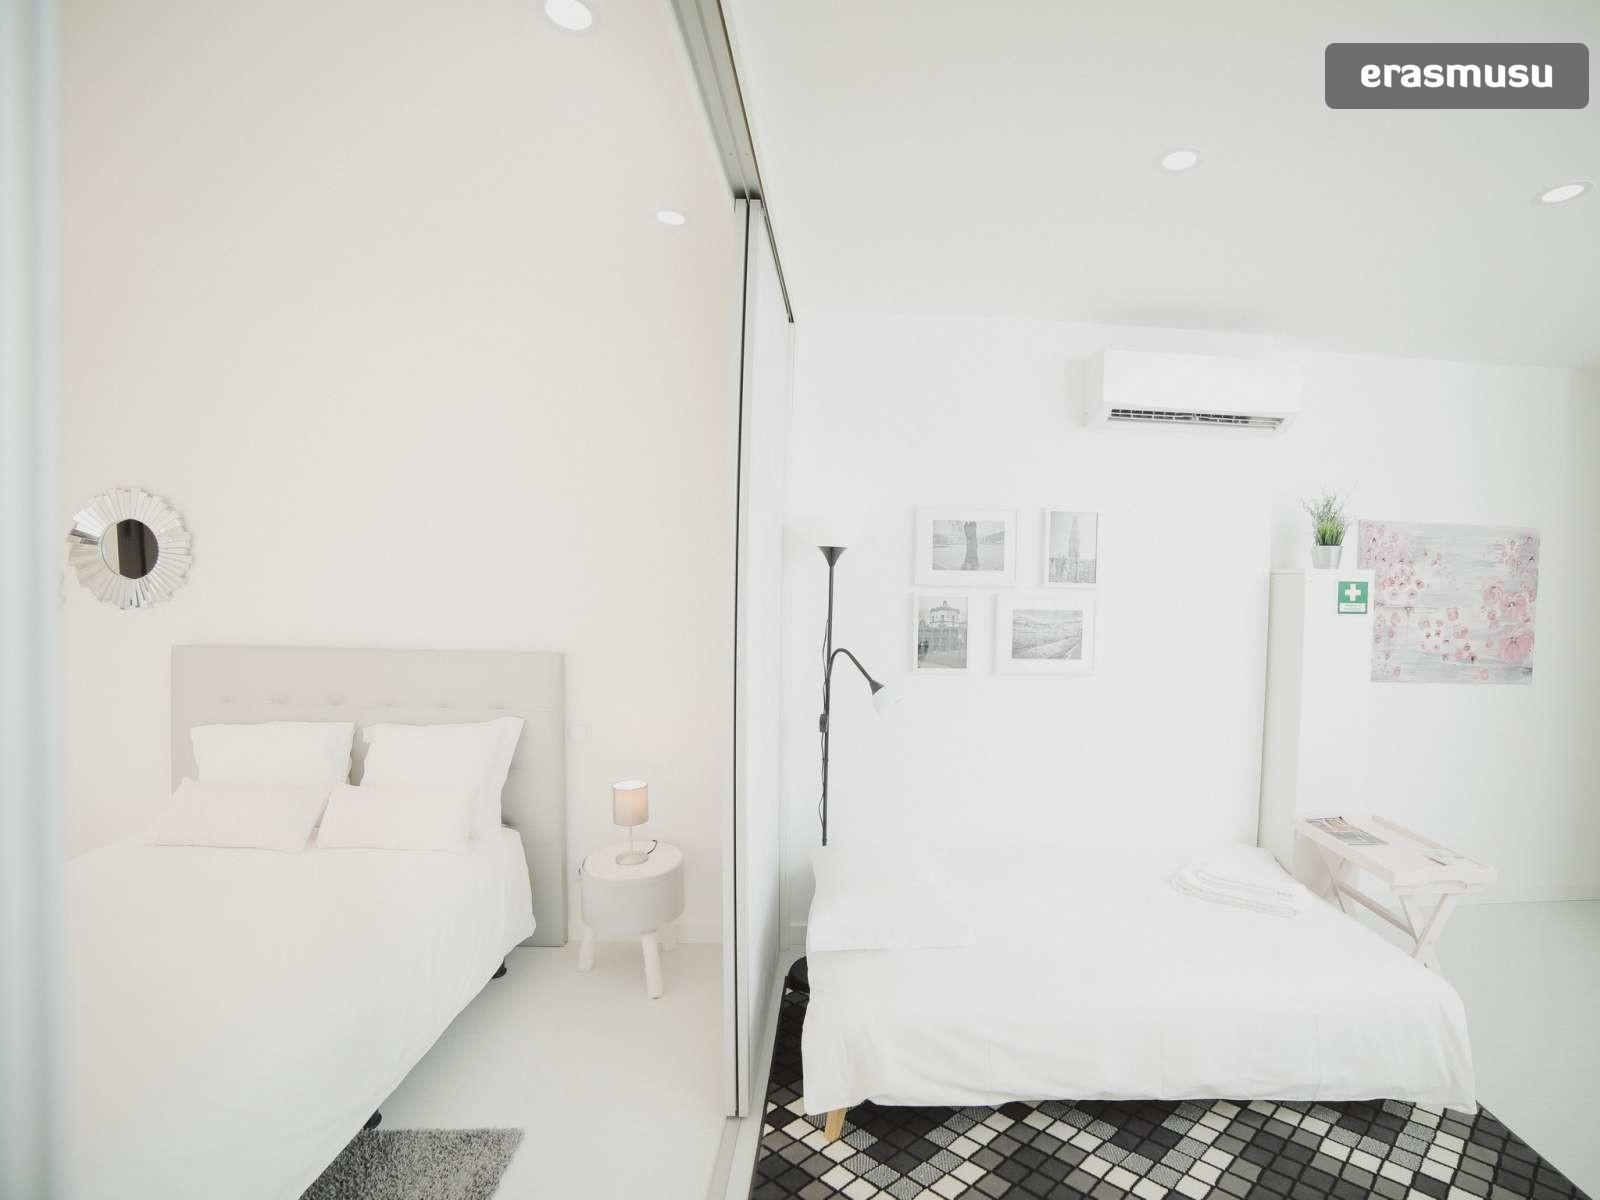 bright-studio-rent-santo-ildefonso-porto-7293b57ffd2938597901b64